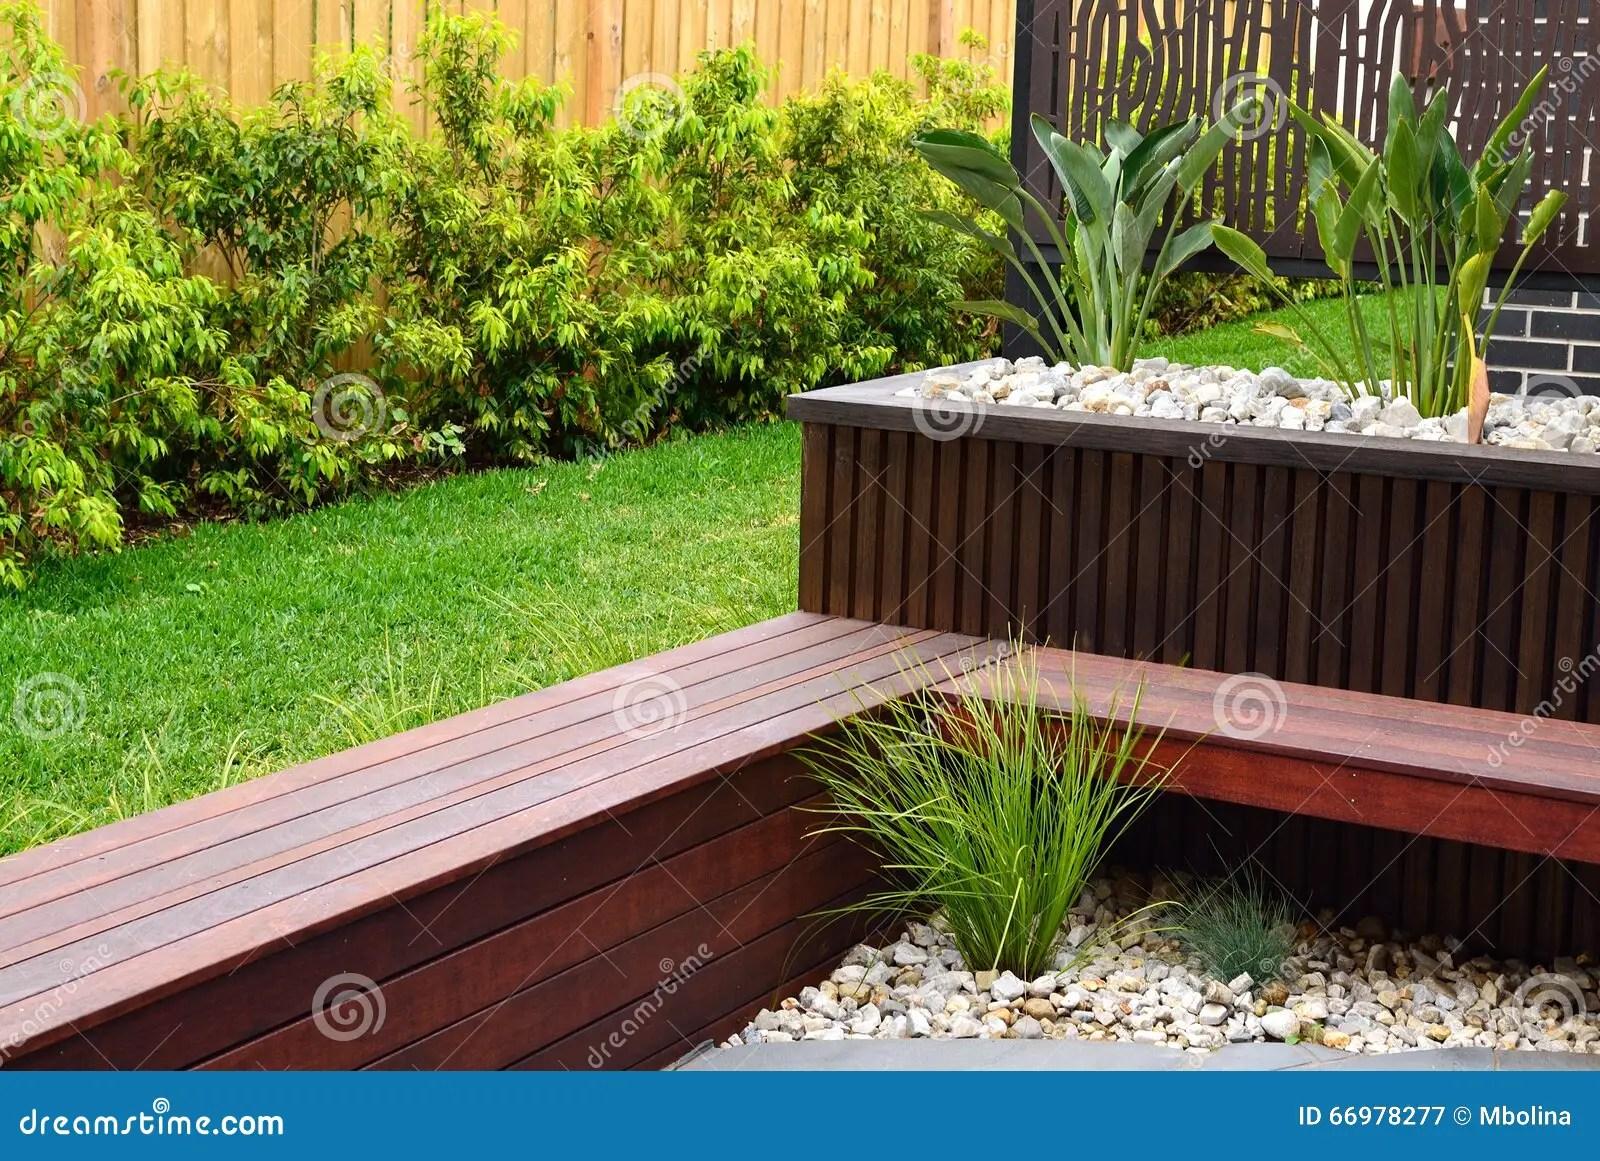 backyard kitchen designs aid double oven 现代后院设计想法库存图片 图片包括有当代 装饰 拱道 工厂 正式 植物 排柱 装饰长凳和岩石的组合